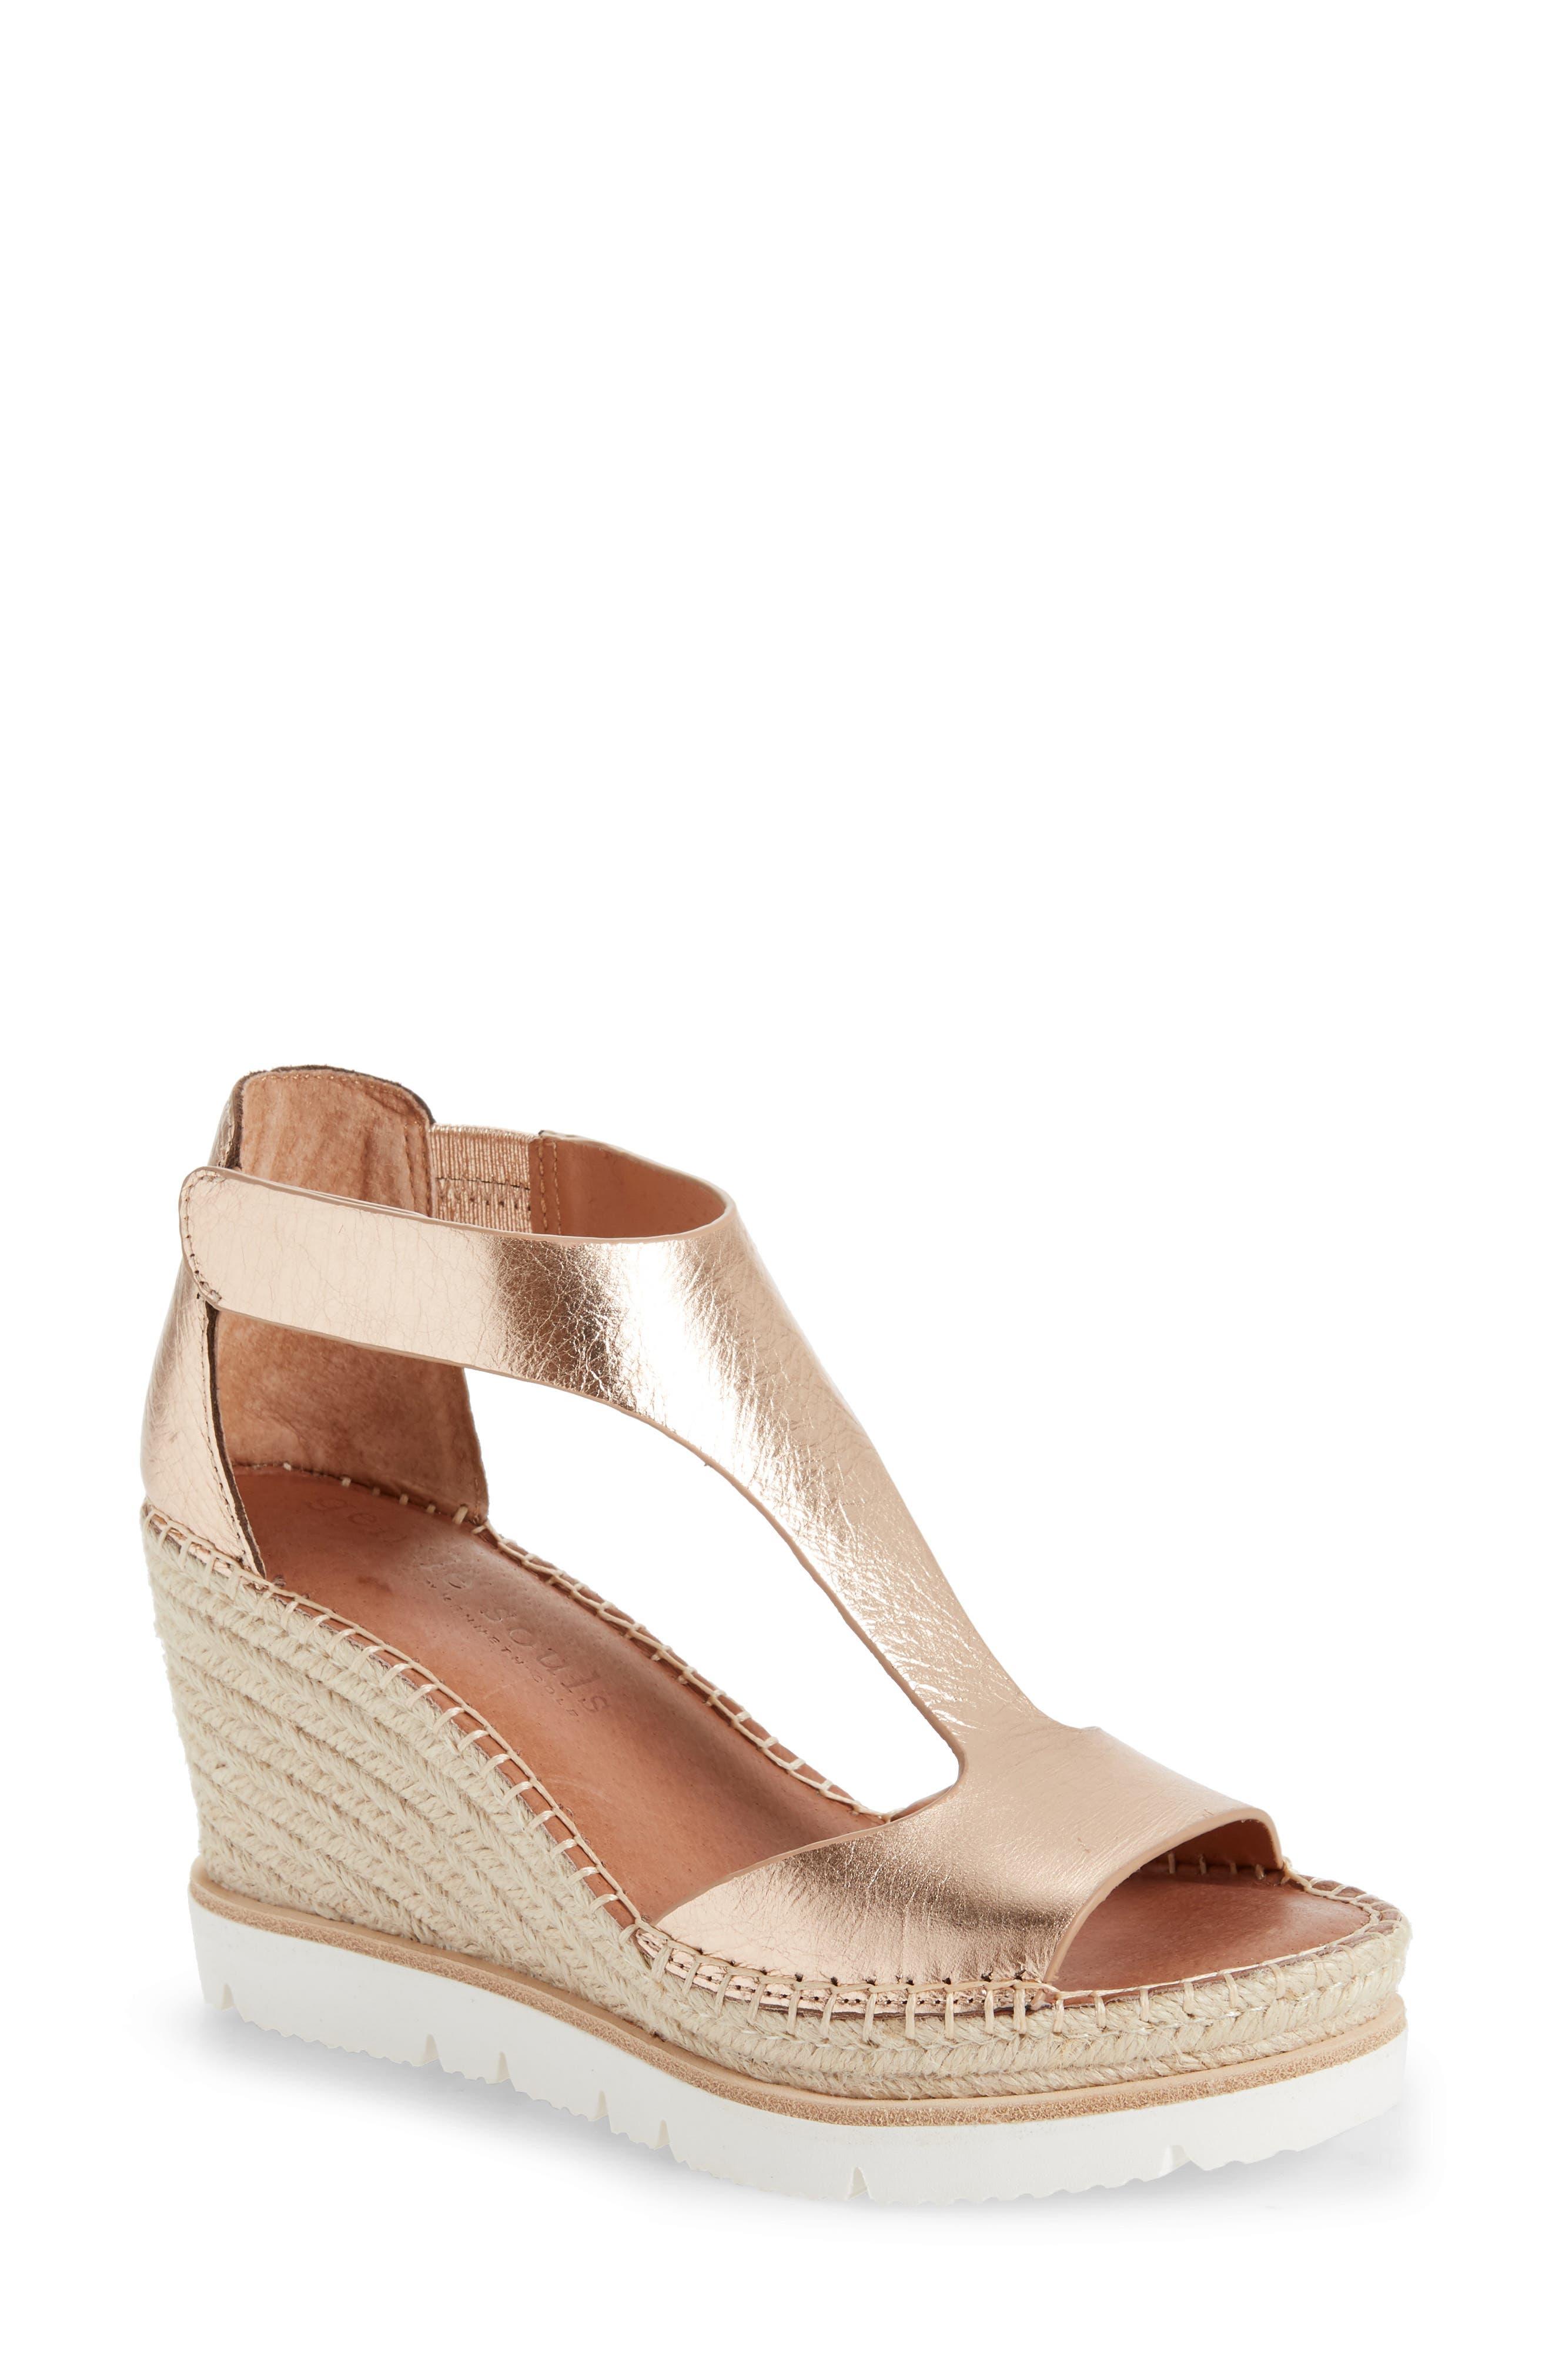 Elyssa T-Strap Wedge Sandal